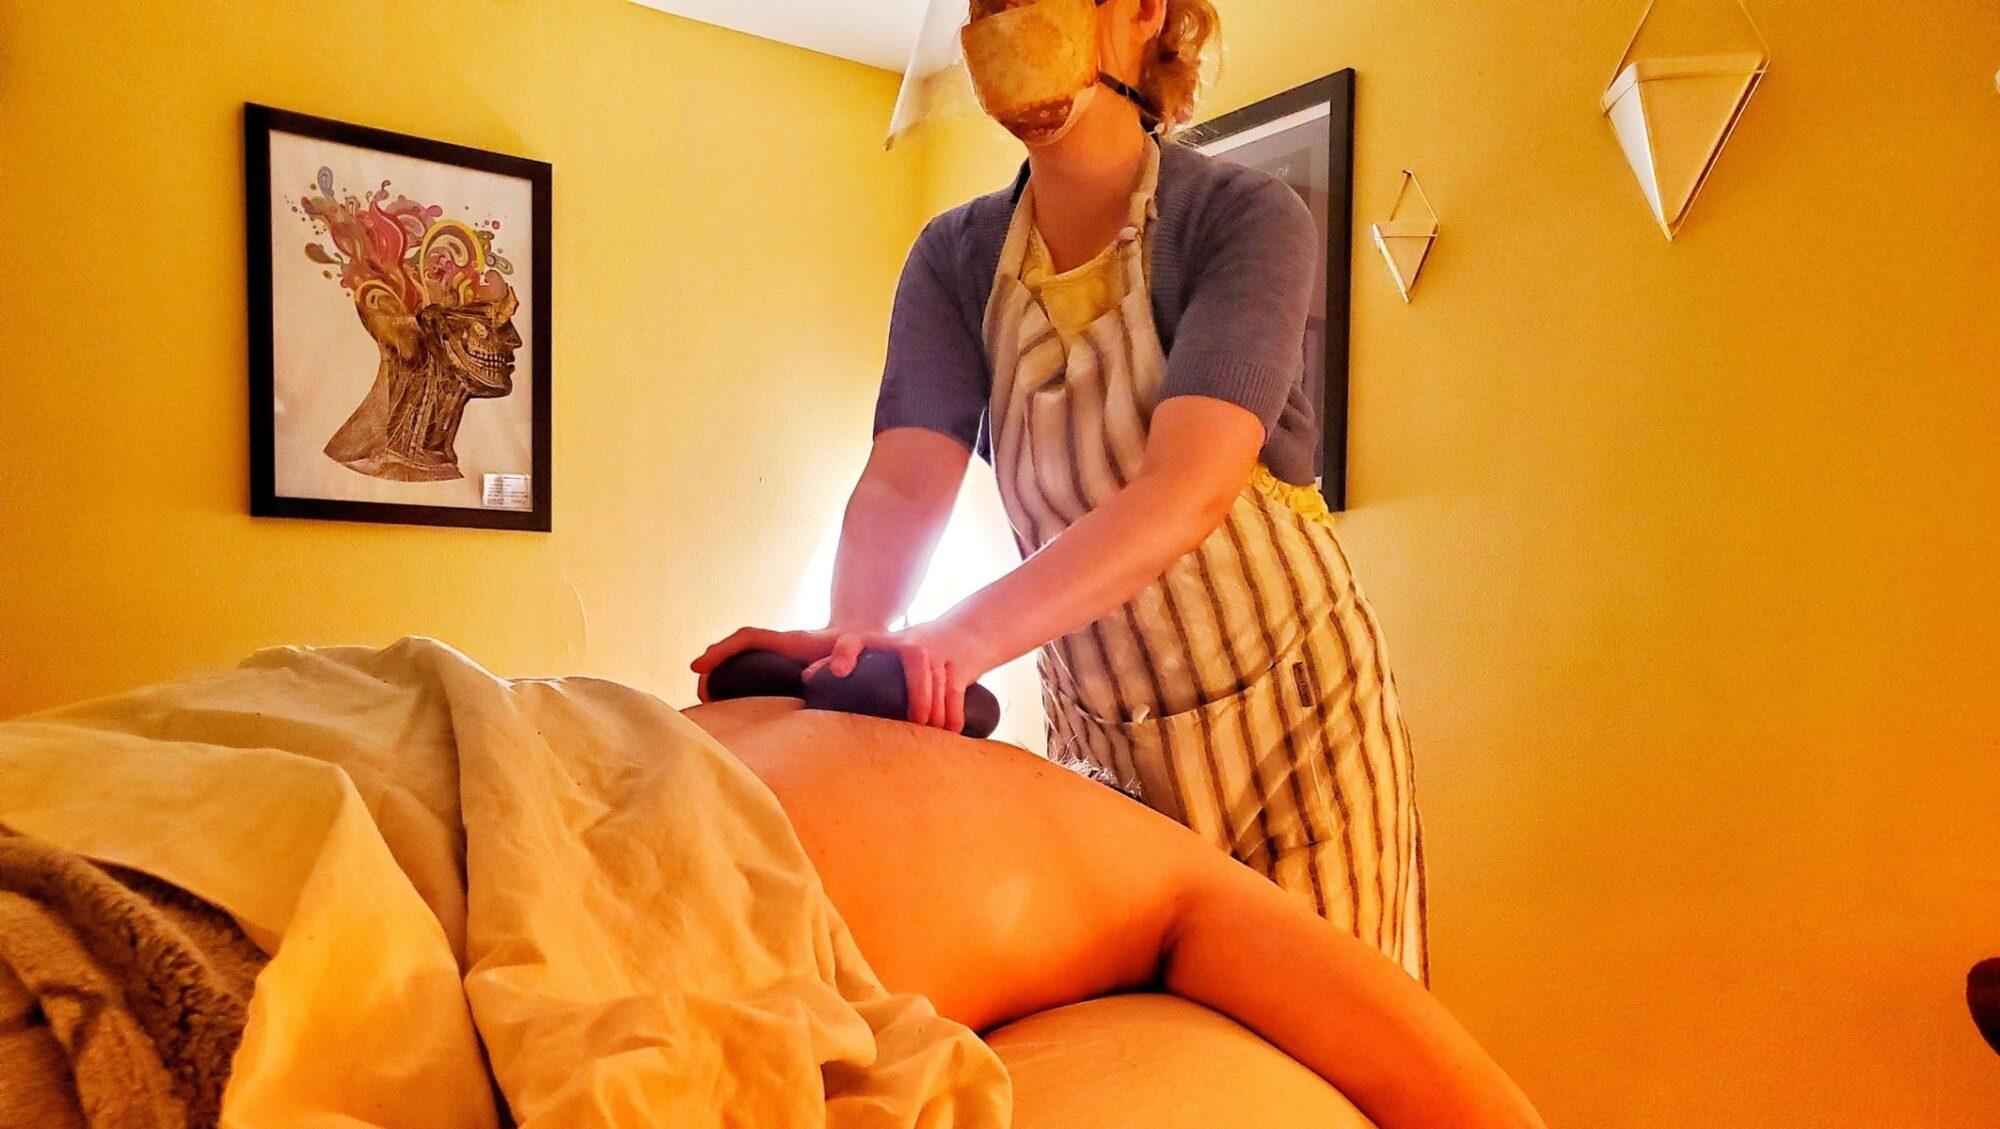 Caring Portland Massage